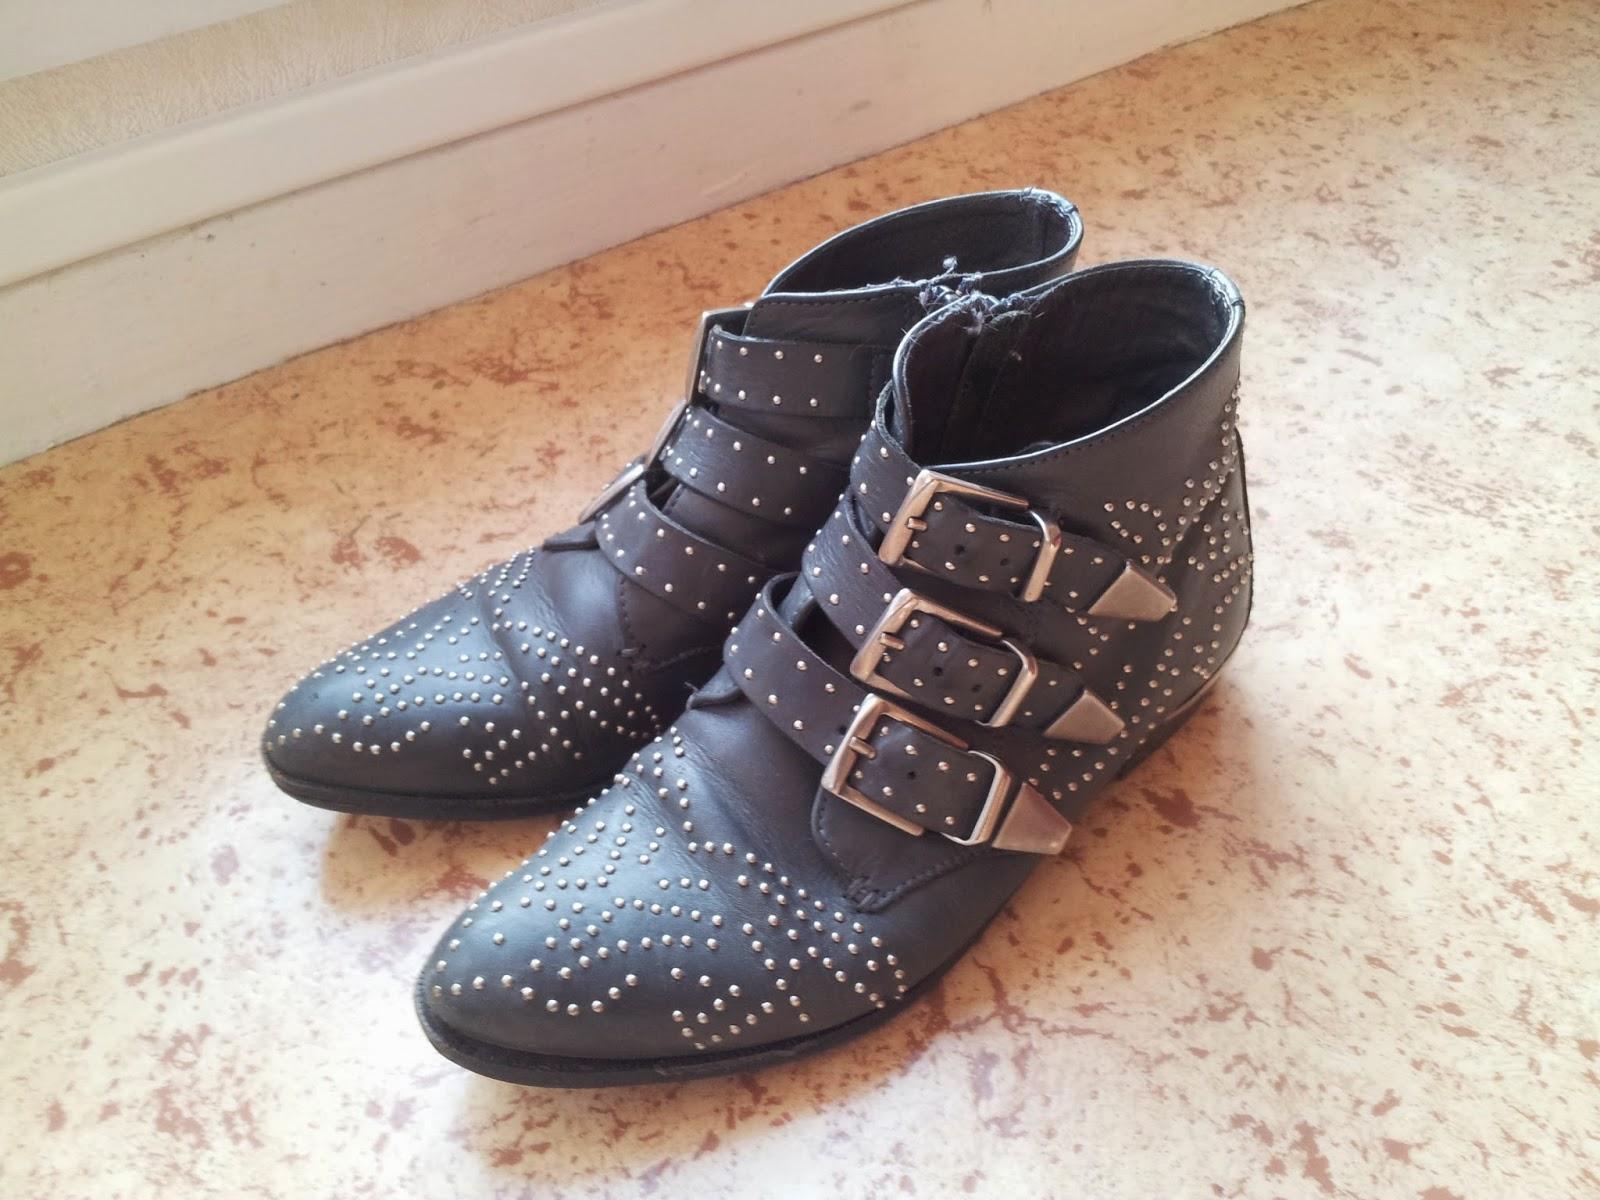 Chaussures - Bottines Bronx yZDG3vwg